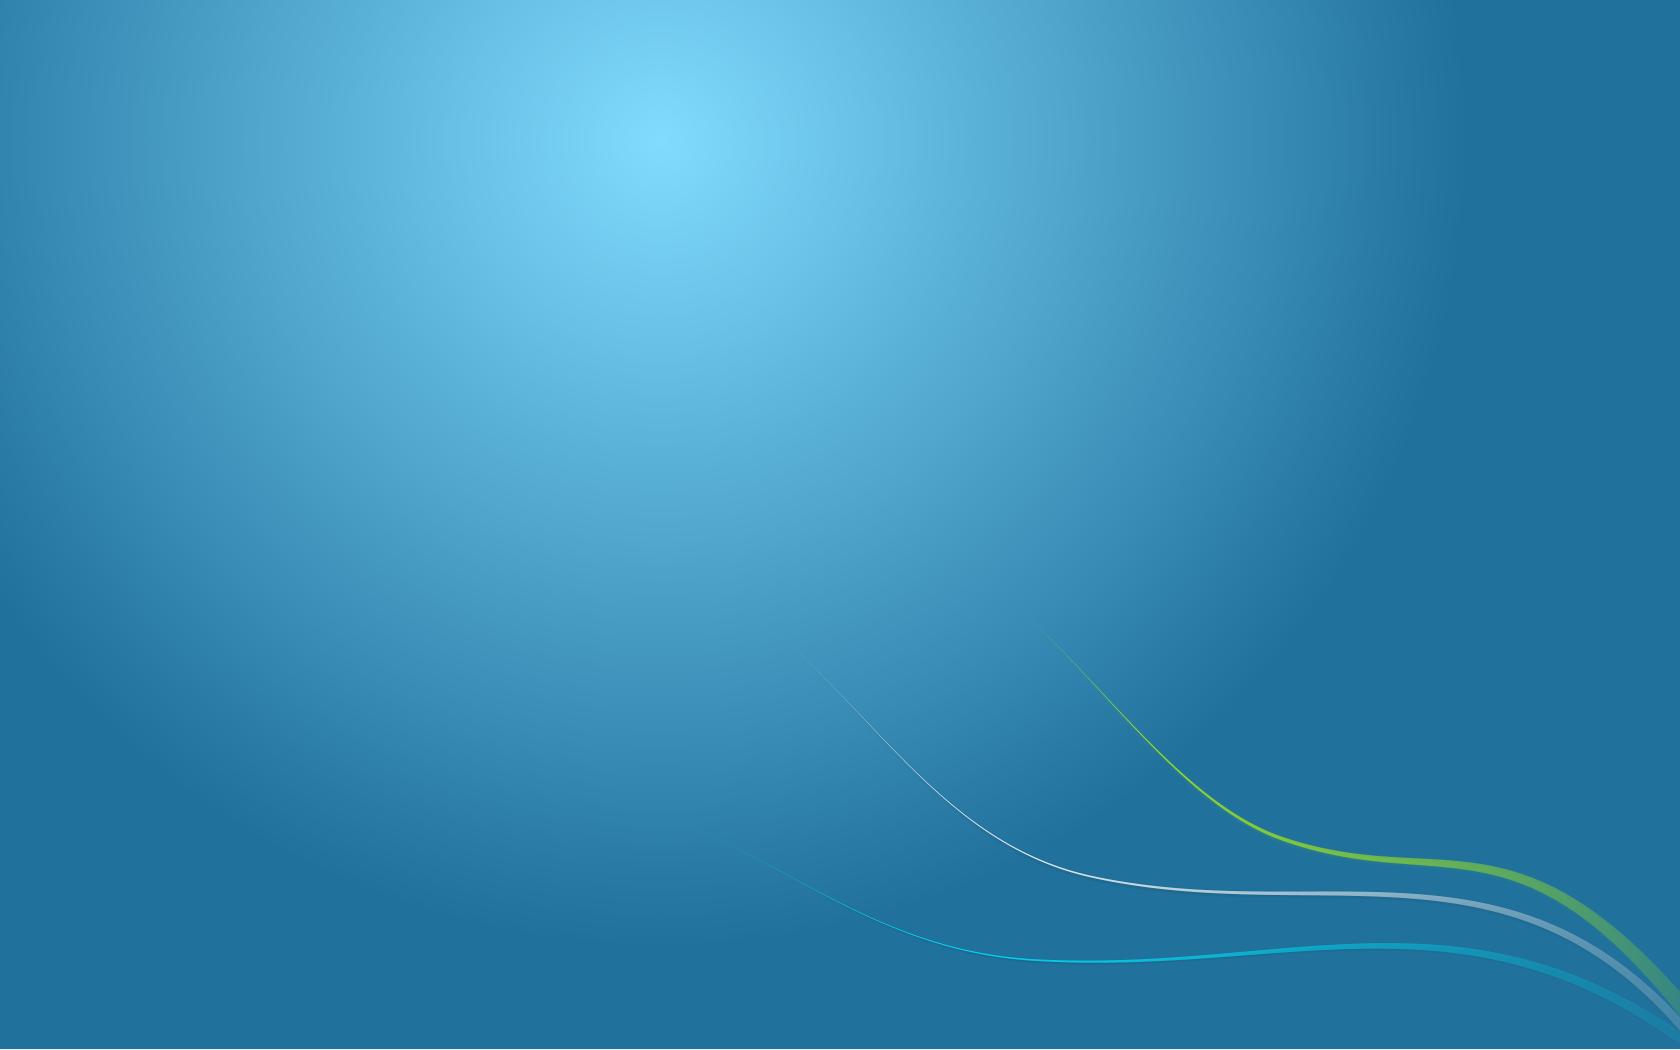 Hd Desktop Backgrounds 1680x1050: Windows 10 Wallpaper 1680x1050